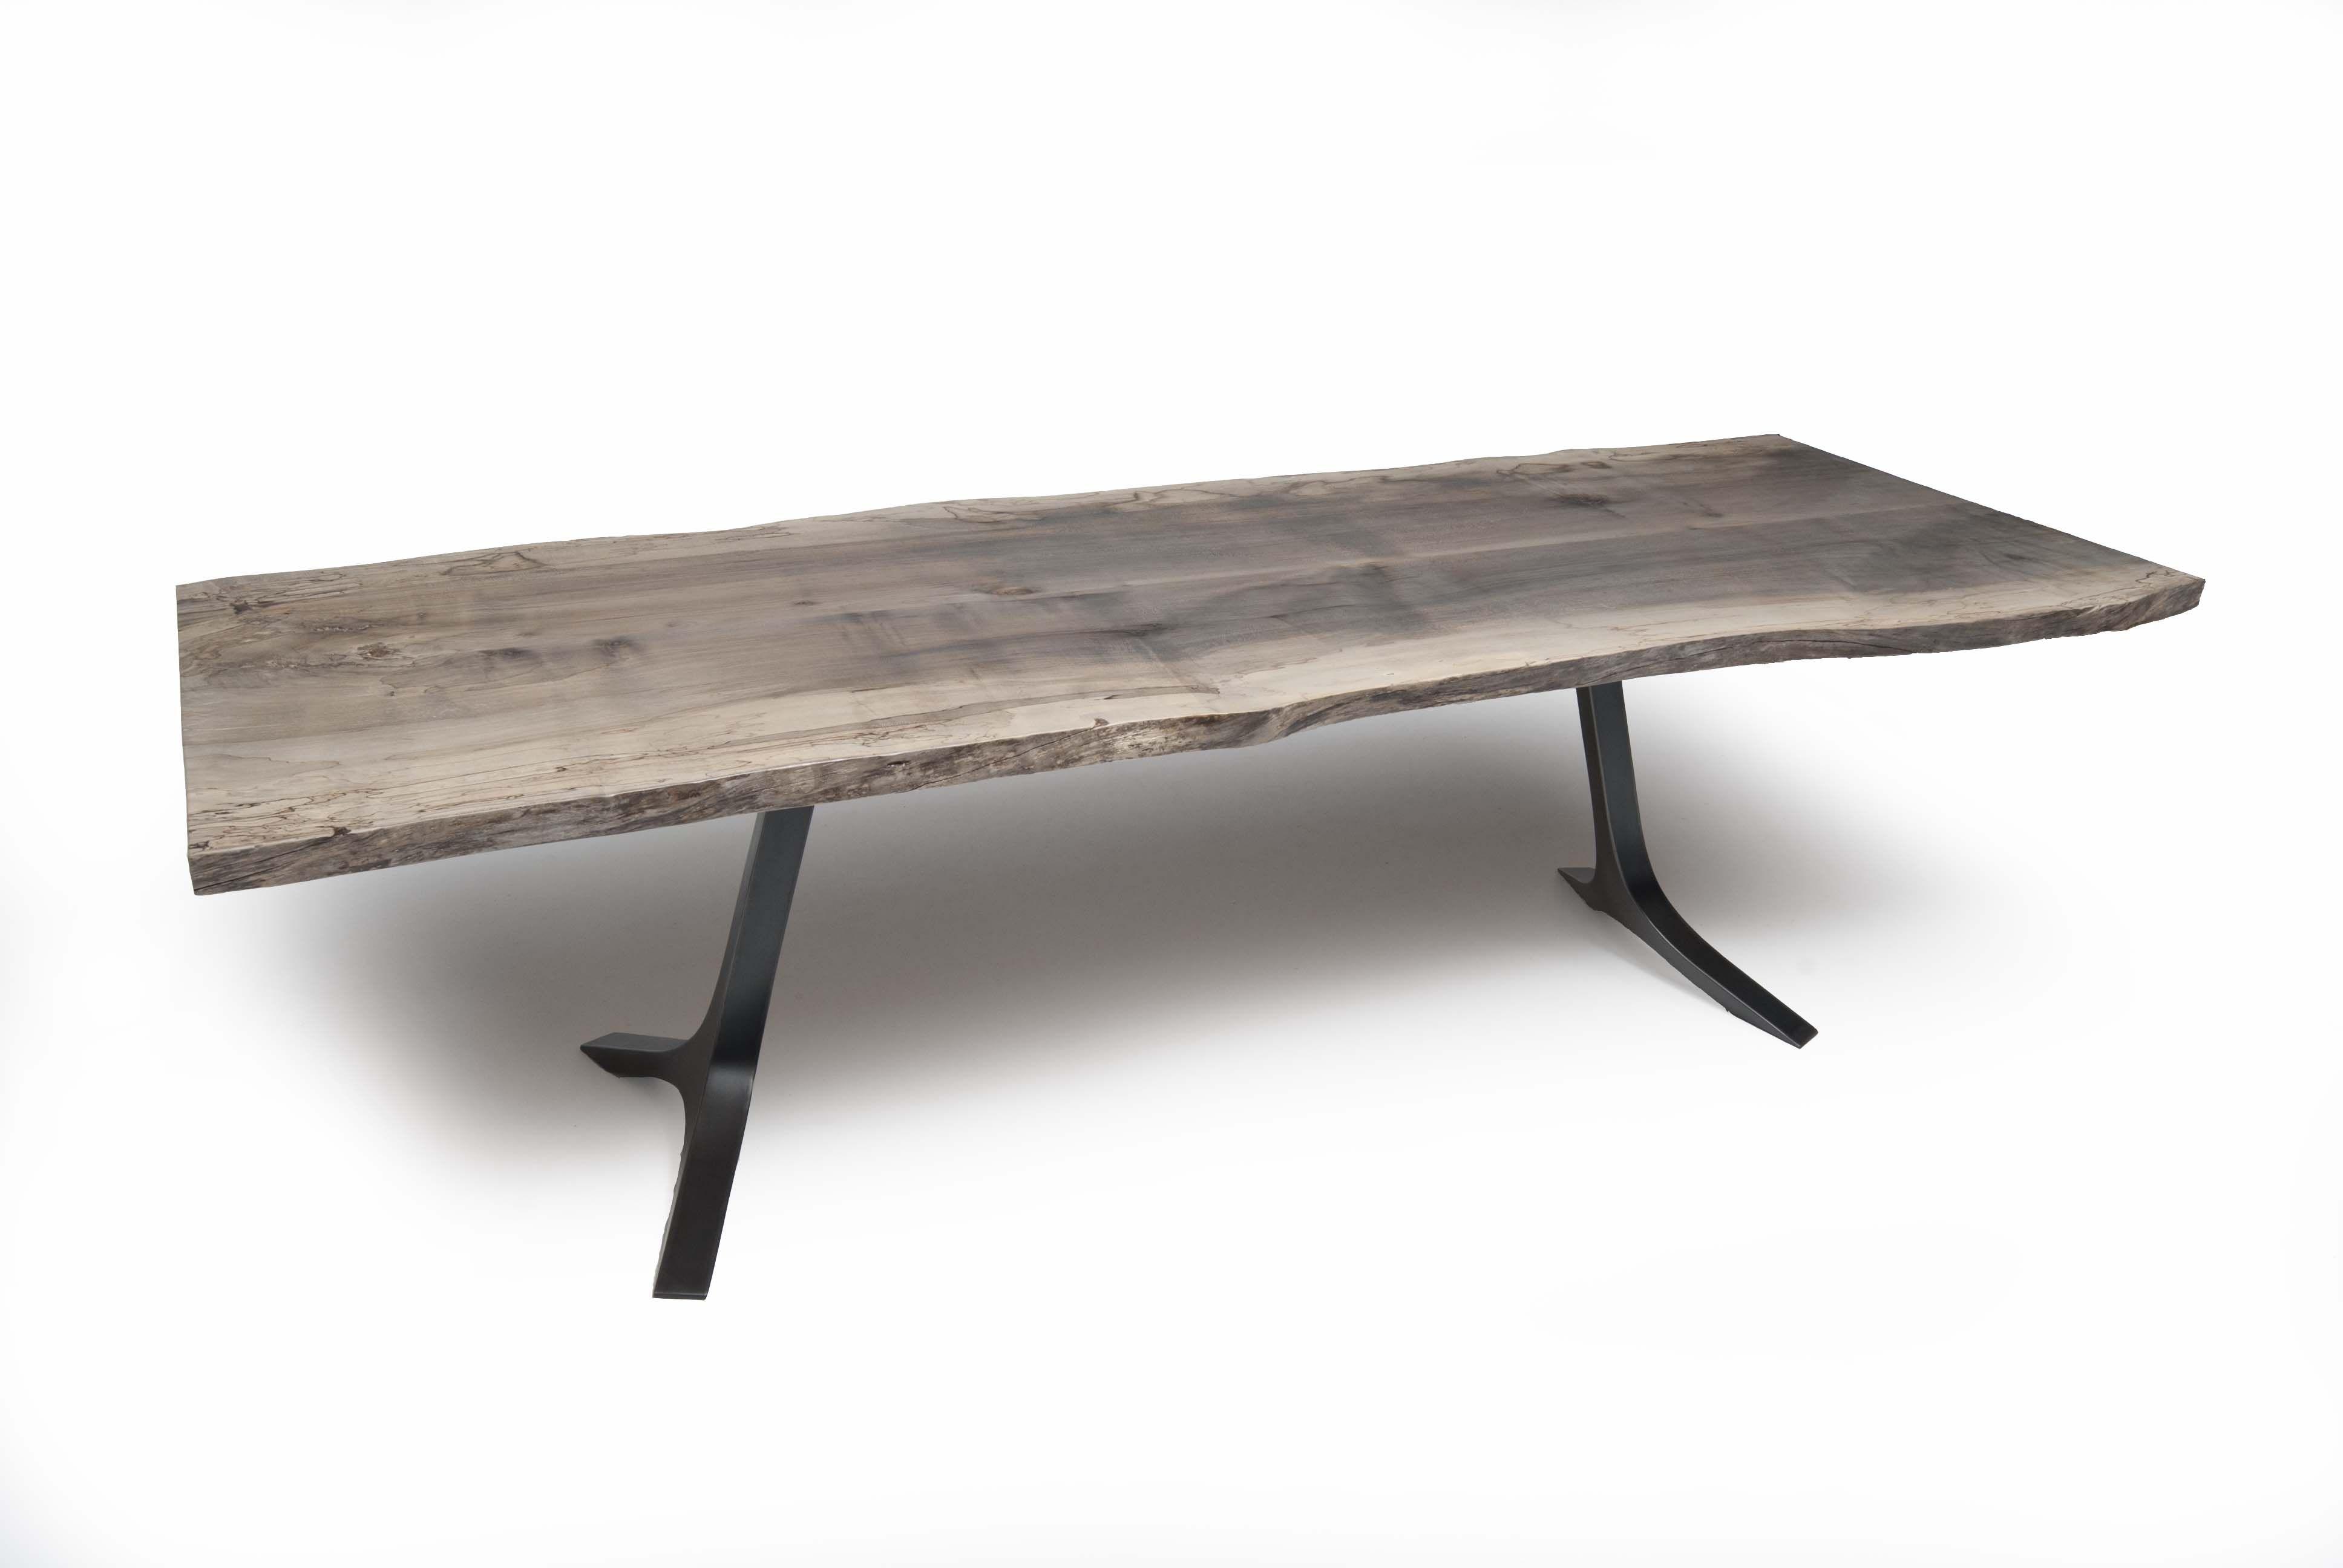 Oxidized Maple Slab Table